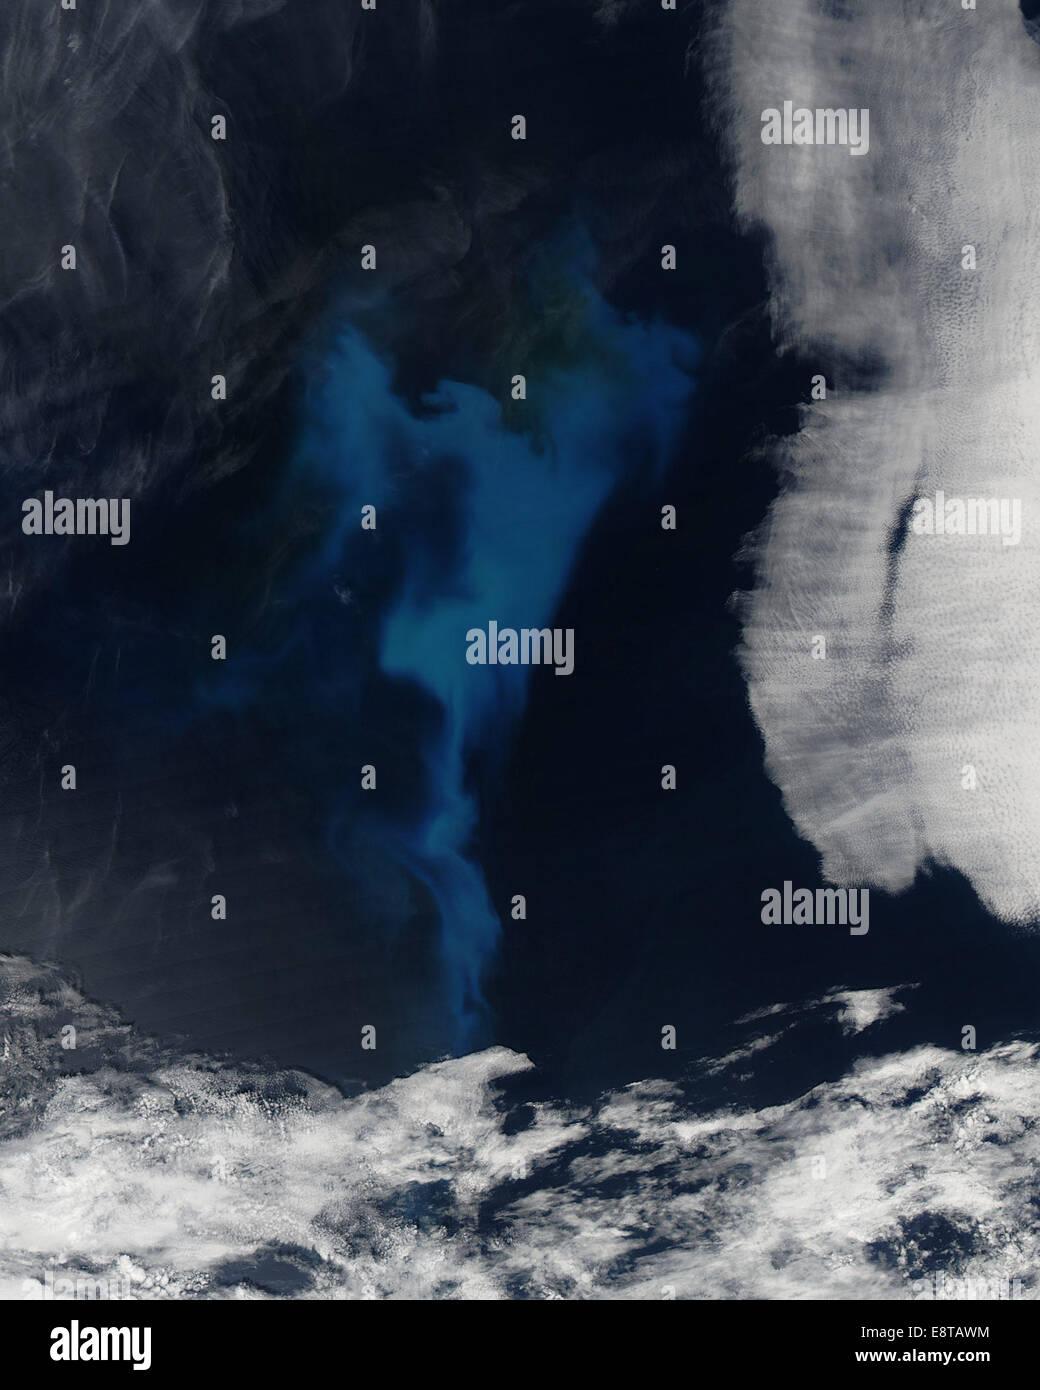 Phytoplankton bloom in the North Atlantic Ocean Stock Photo